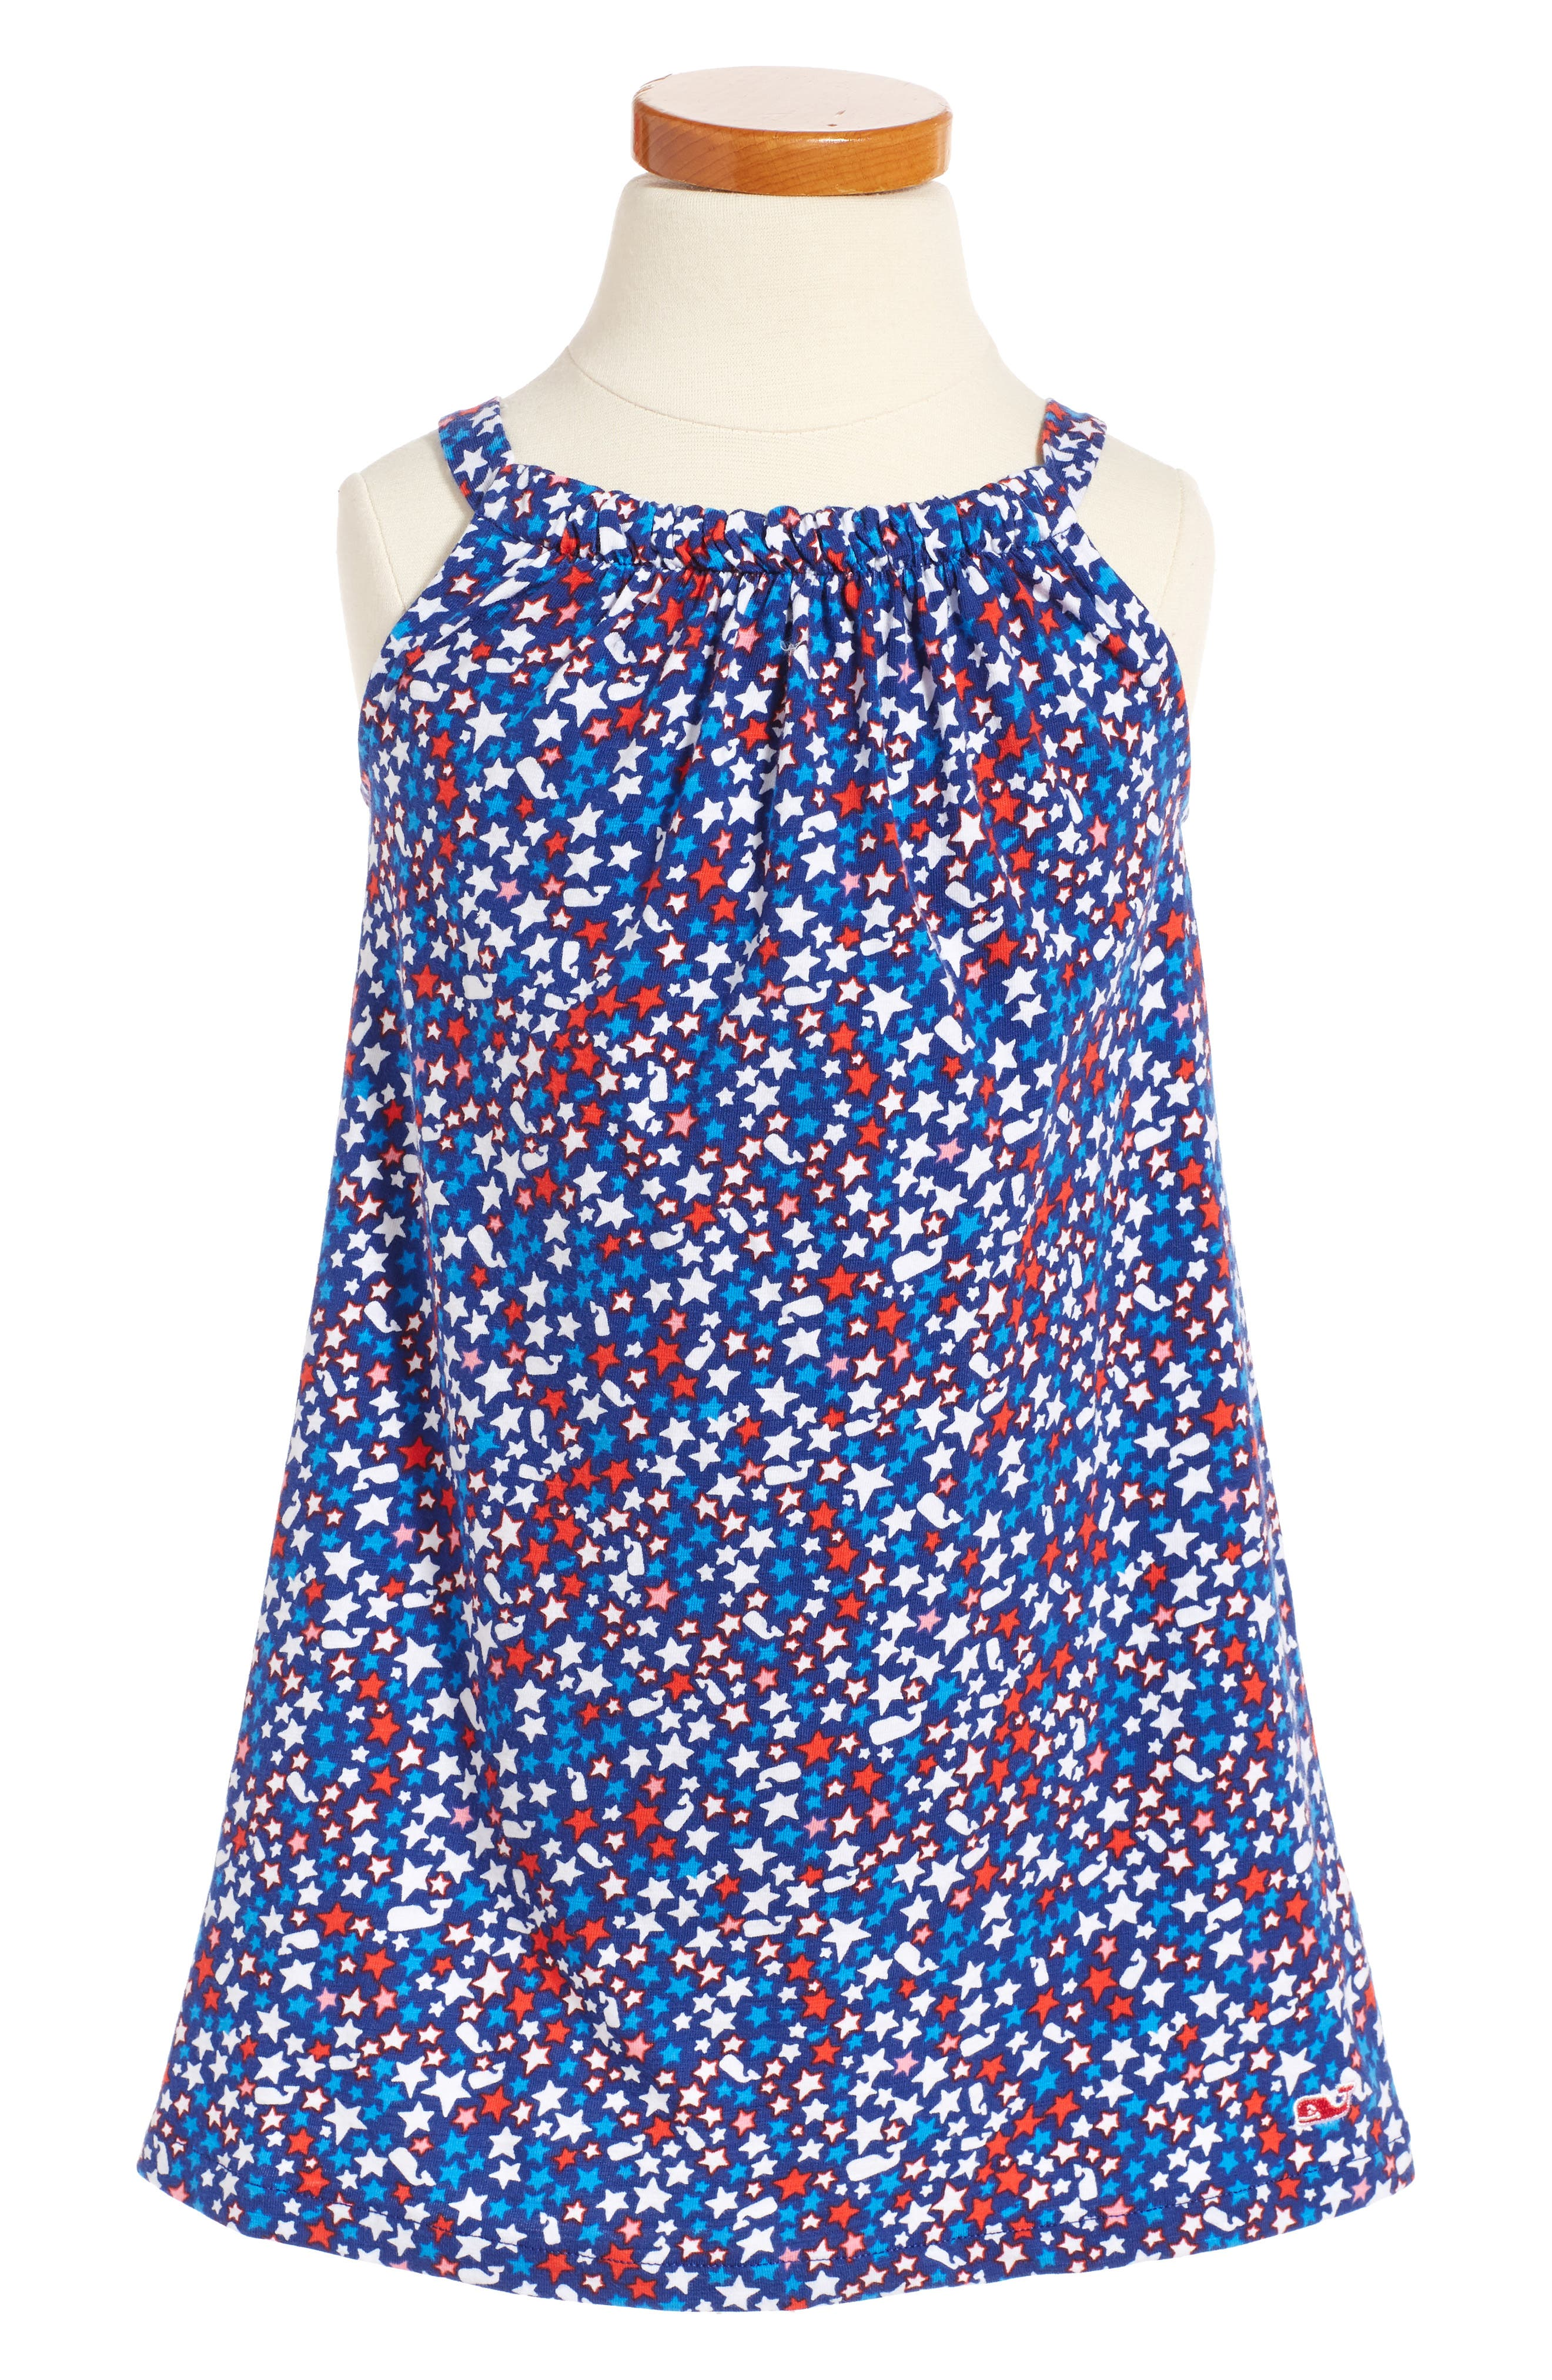 Main Image - Vineyard Vines Stars & Whales Shift Dress (Toddler Girls)